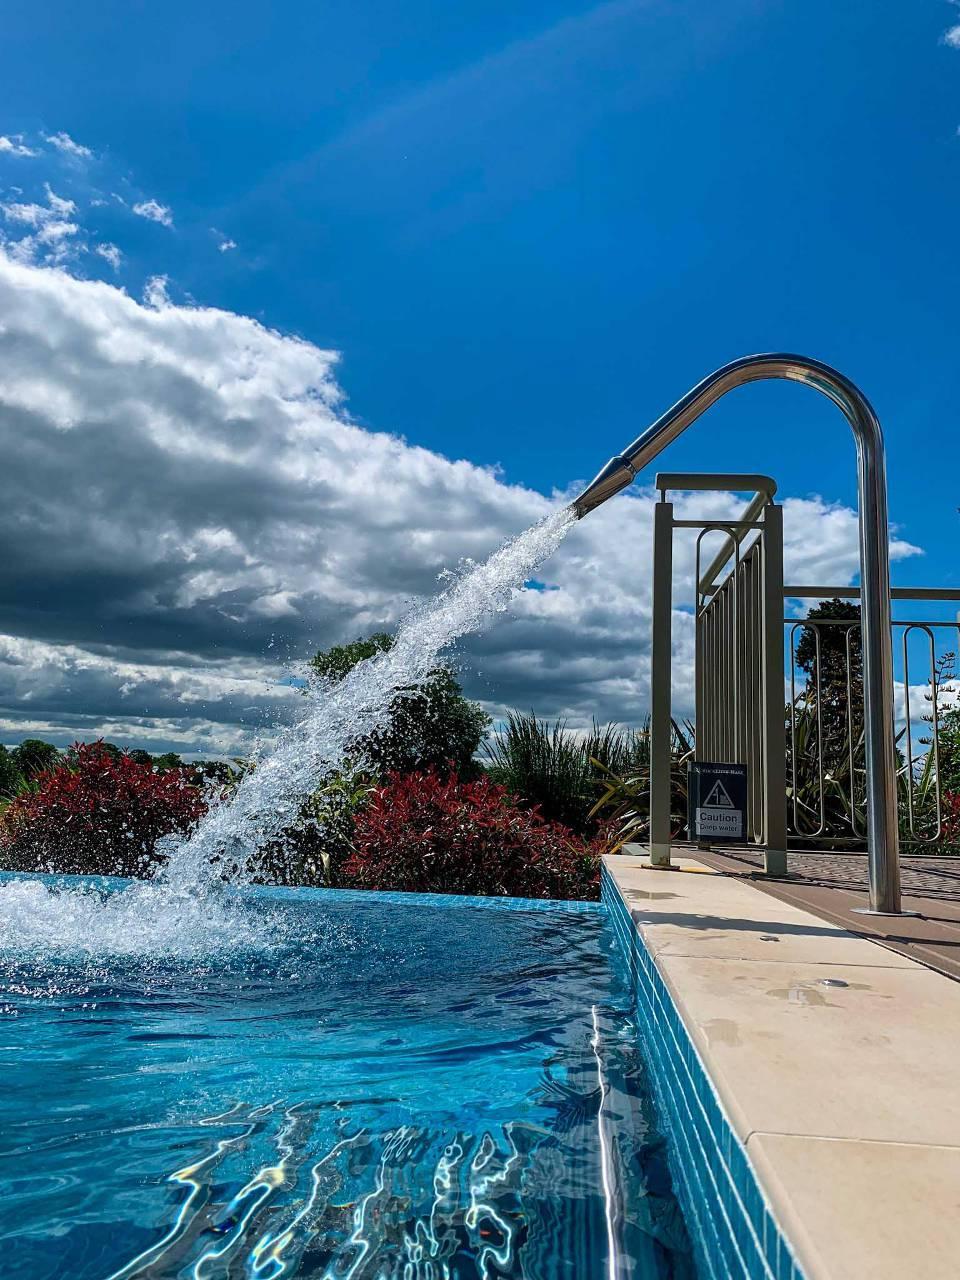 Rockliffe Spa Garden in Pool Shot